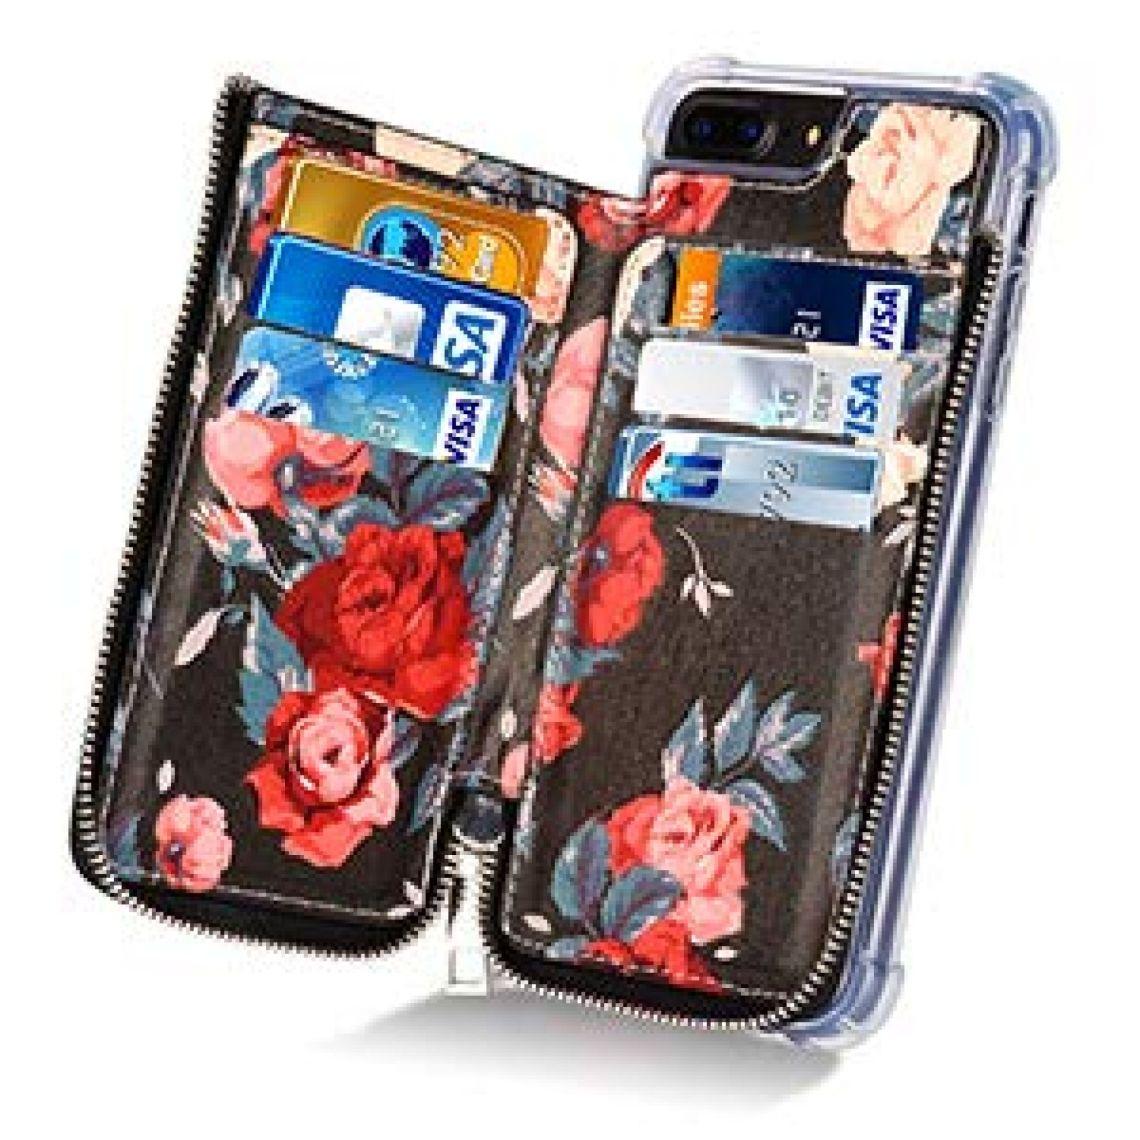 "Amazon.com: iPhone 7 Plus Wallet Case,iPhone 8 Plus Wallet Case,MISSCASE Premium PU Leather Card Holder Case with Strap,Zipper Pockets,Flower Pattern Cover for iPhone 7 Plus/ 8 Plus / 6 Plus 5.5"" Red: Cell Phones & Accessories"